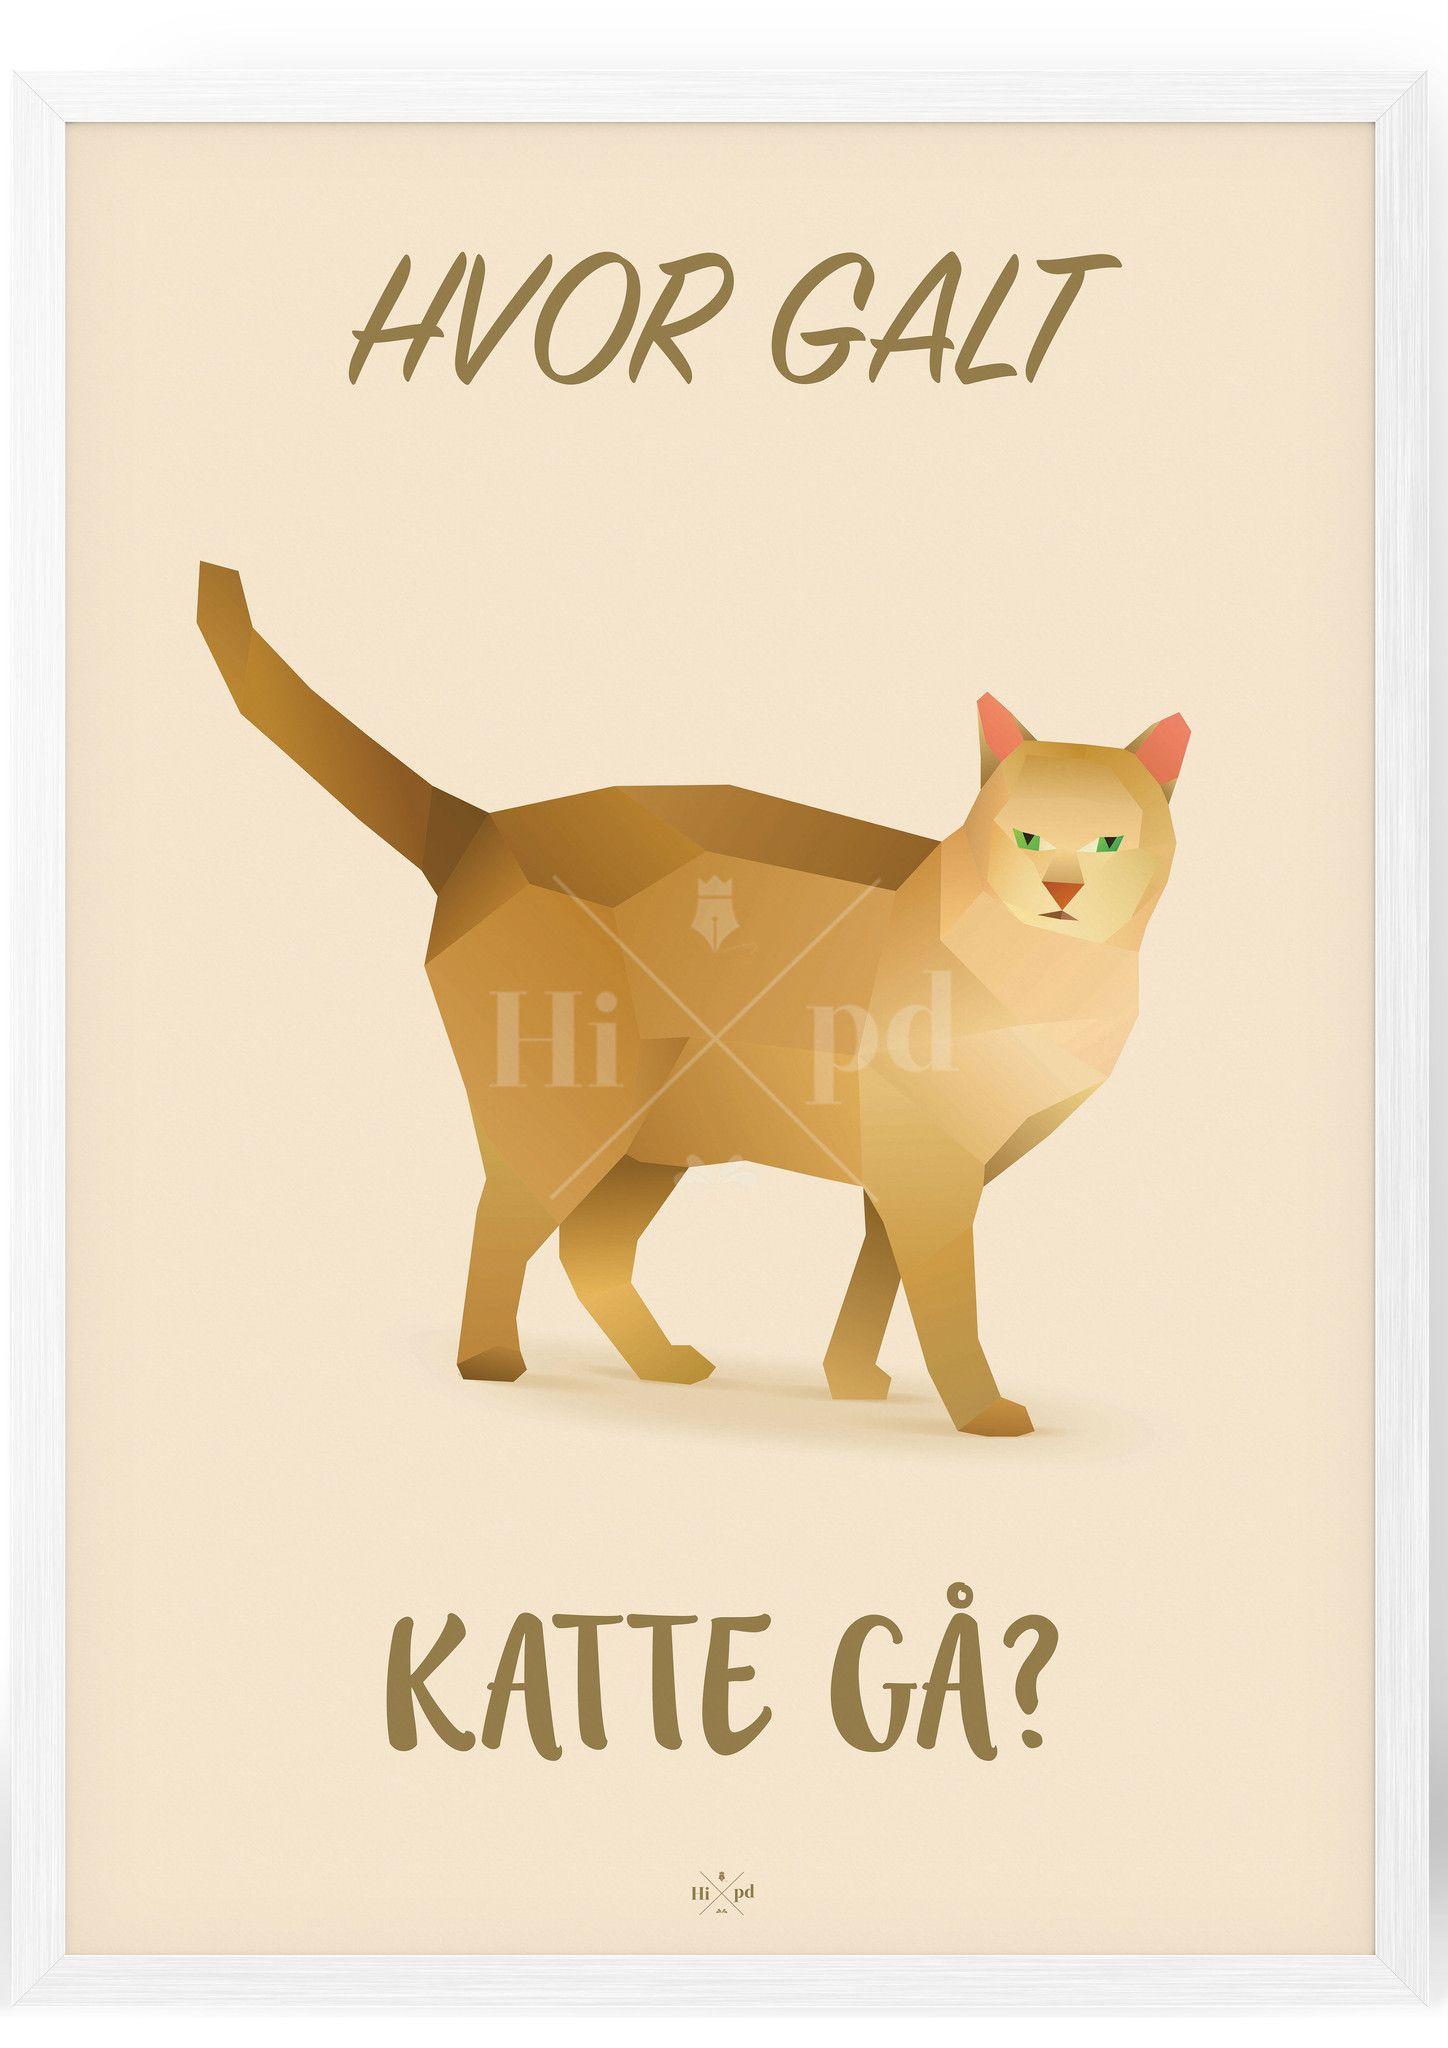 katte citater